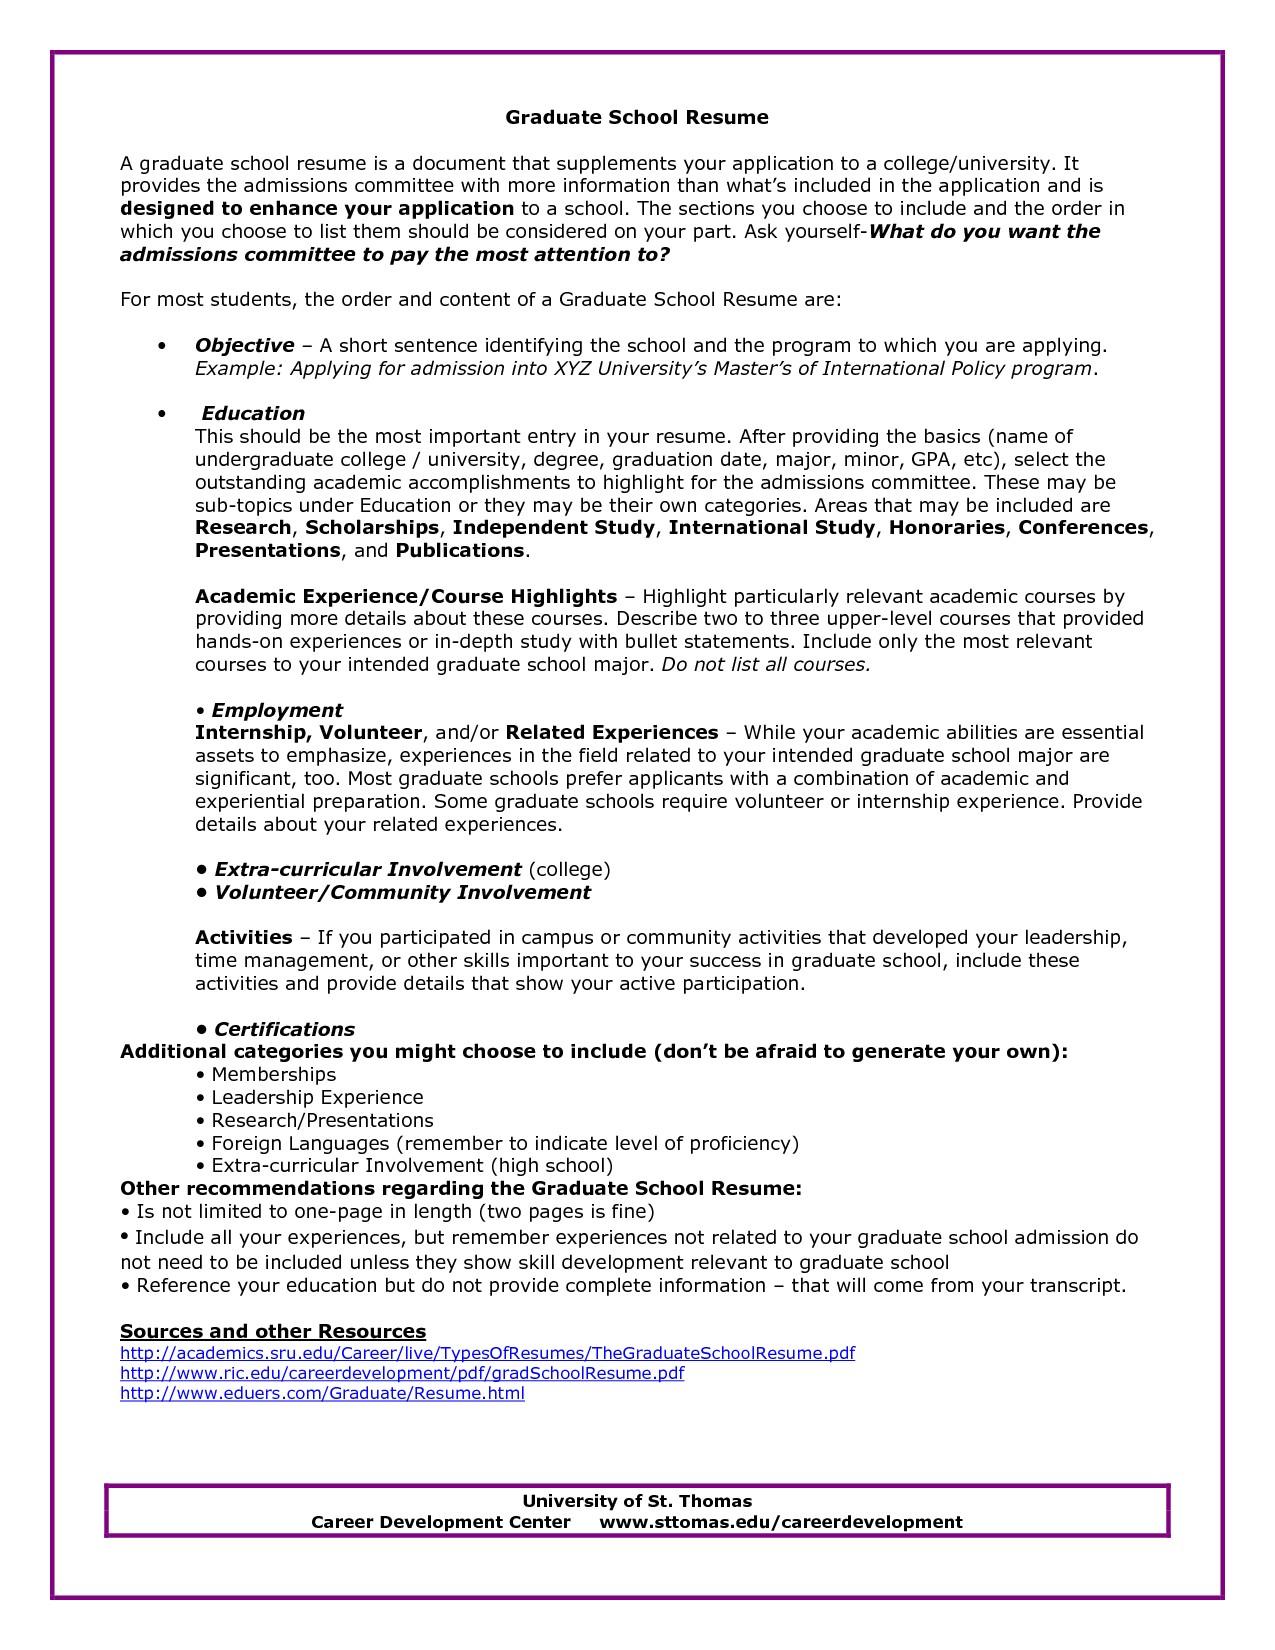 Resume Graduate School Sample Graduate School Admissions Resume Sample Http Www